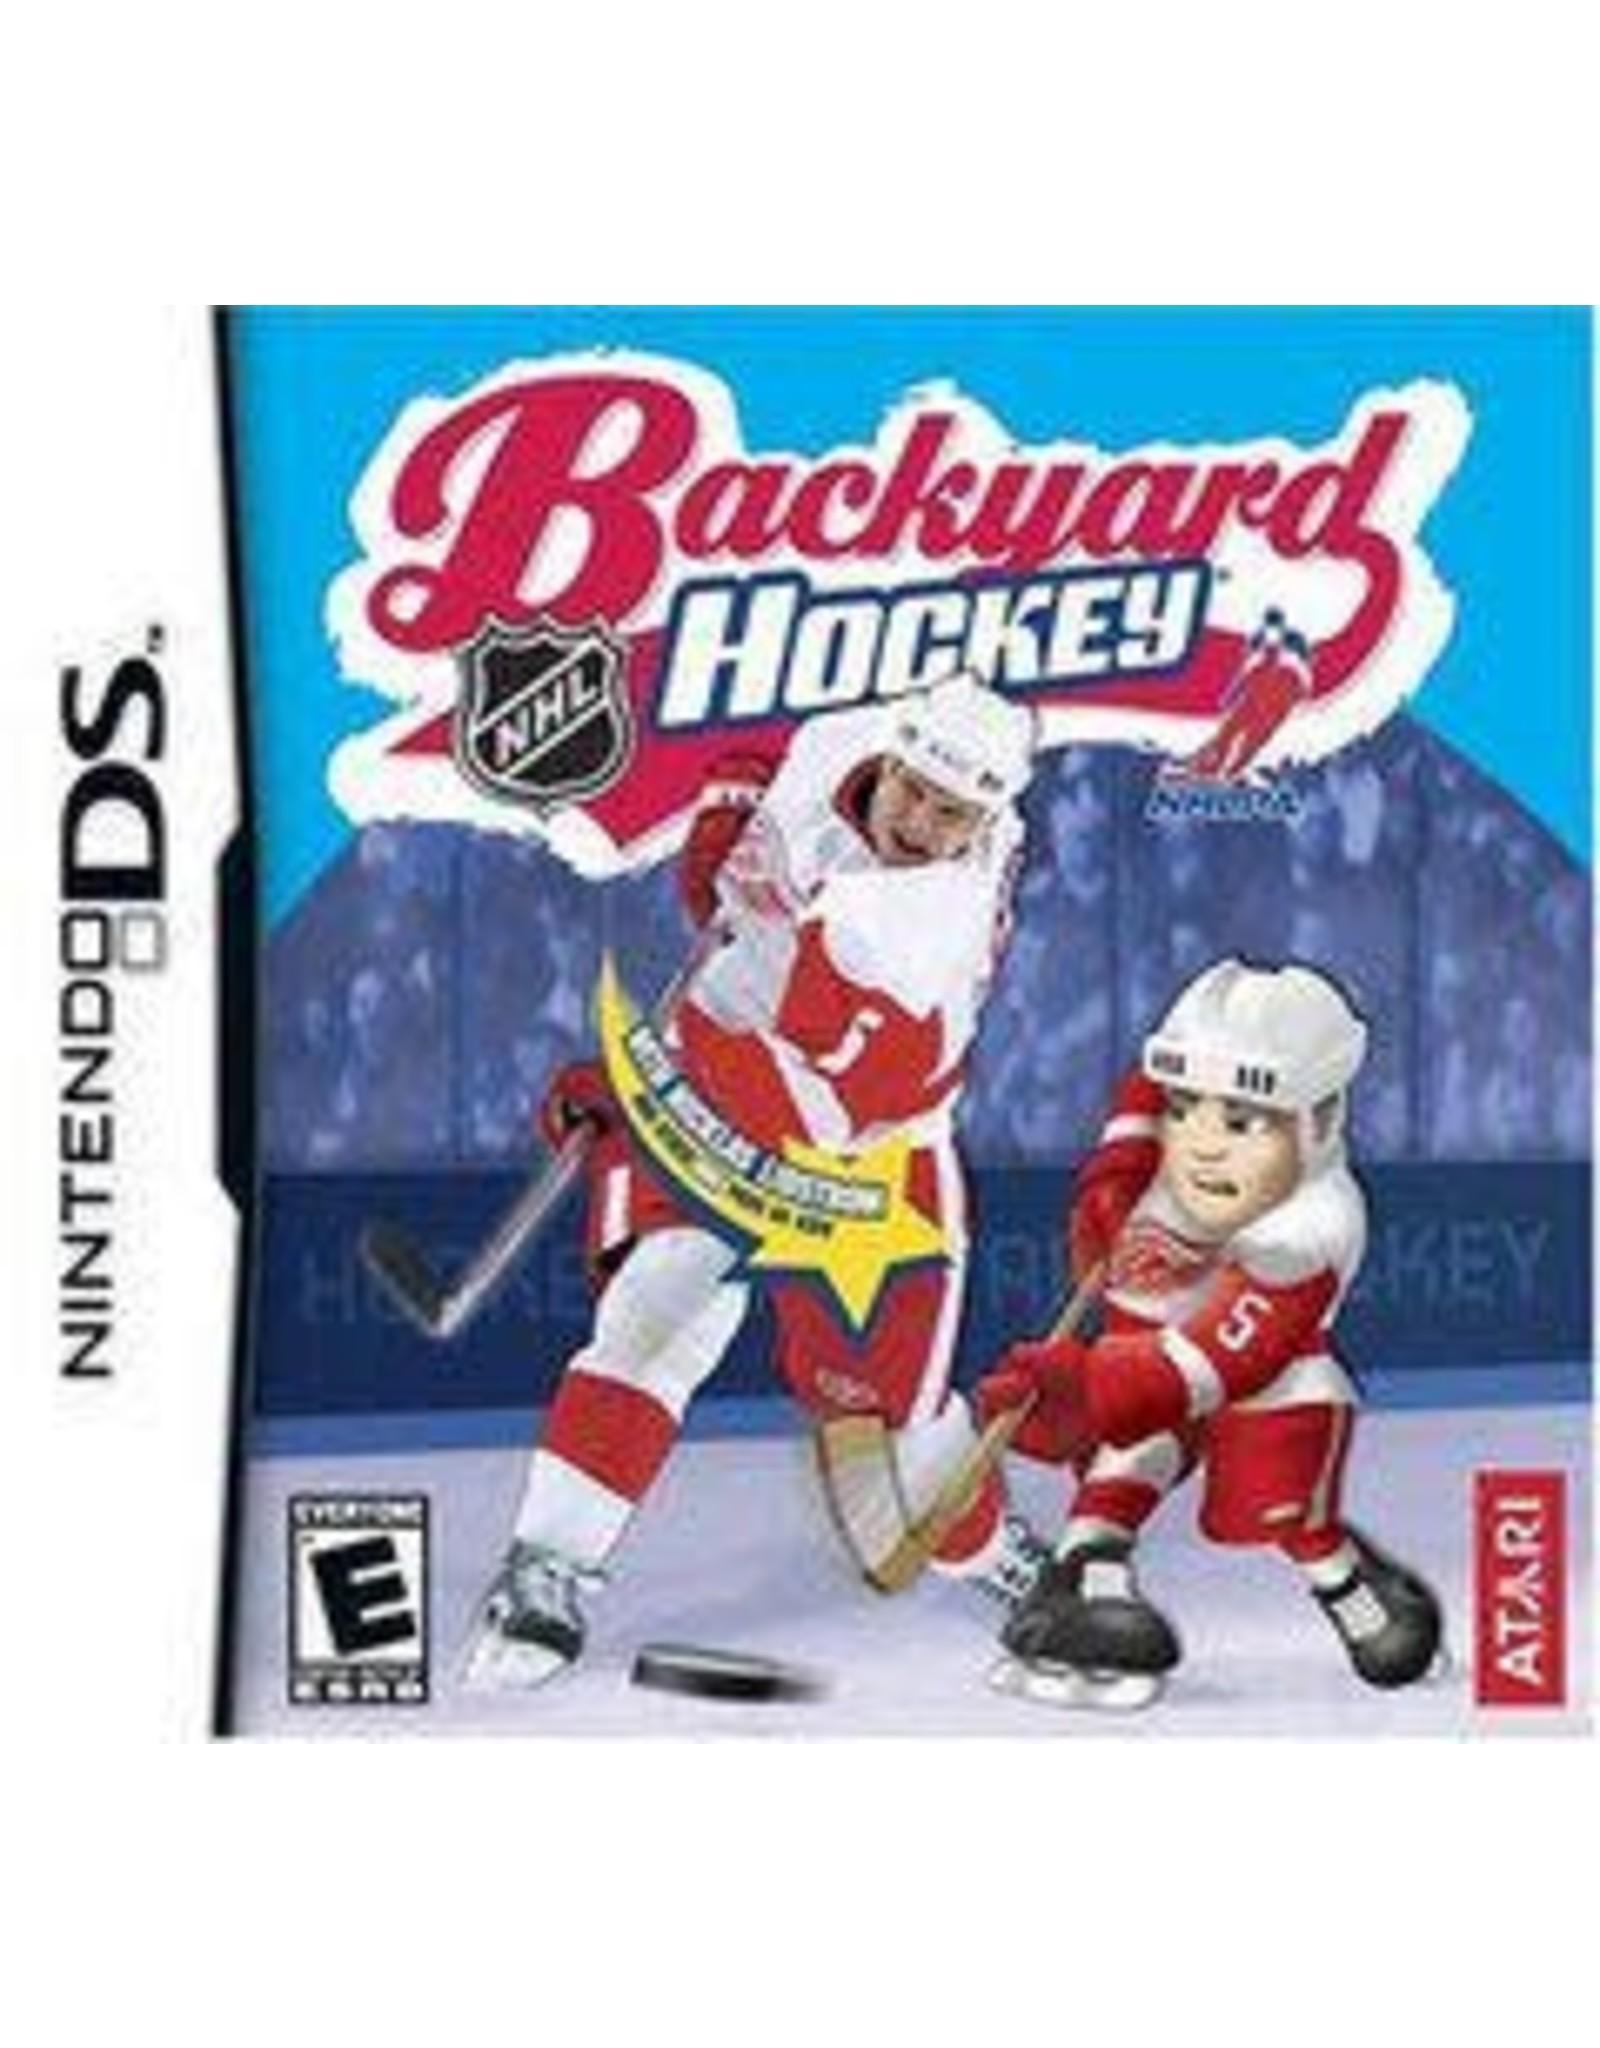 Nintendo DS Backyard Hockey (CiB)